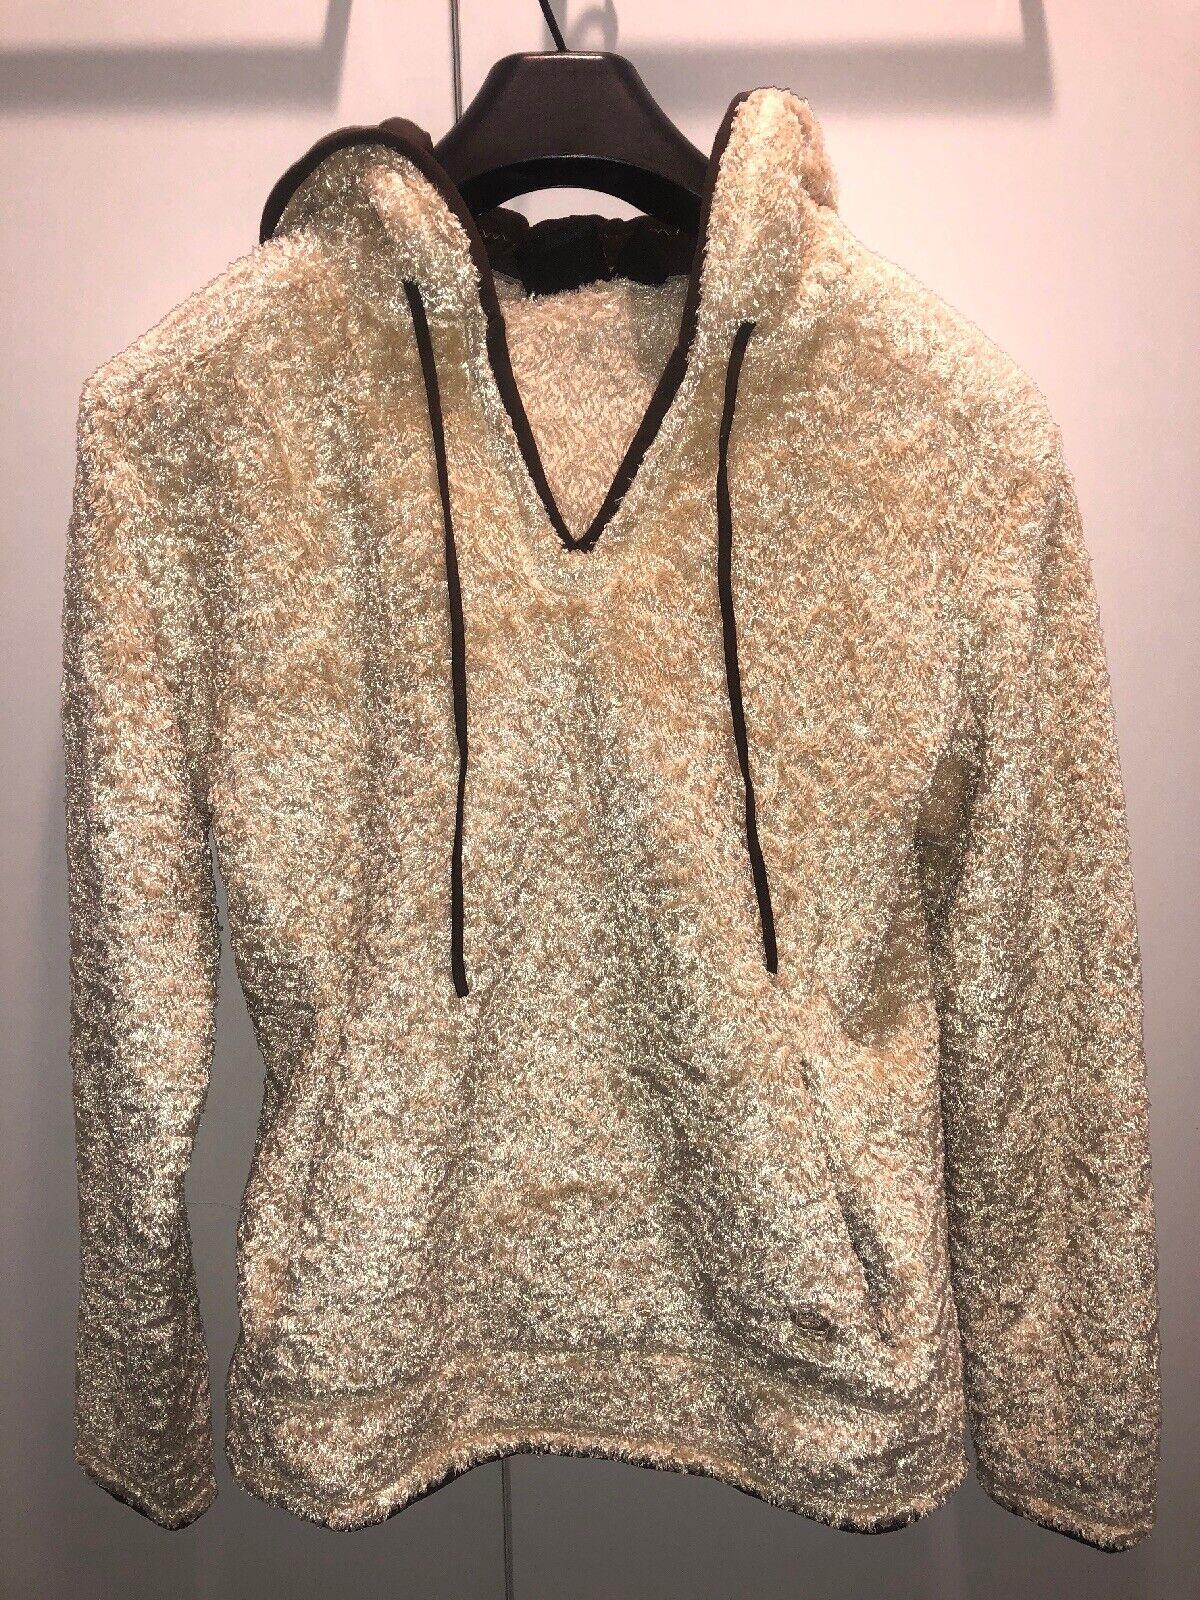 Mountain Hardwear Womens Small Pullover Poodle Fleece Hoodie Soft Plush Cream